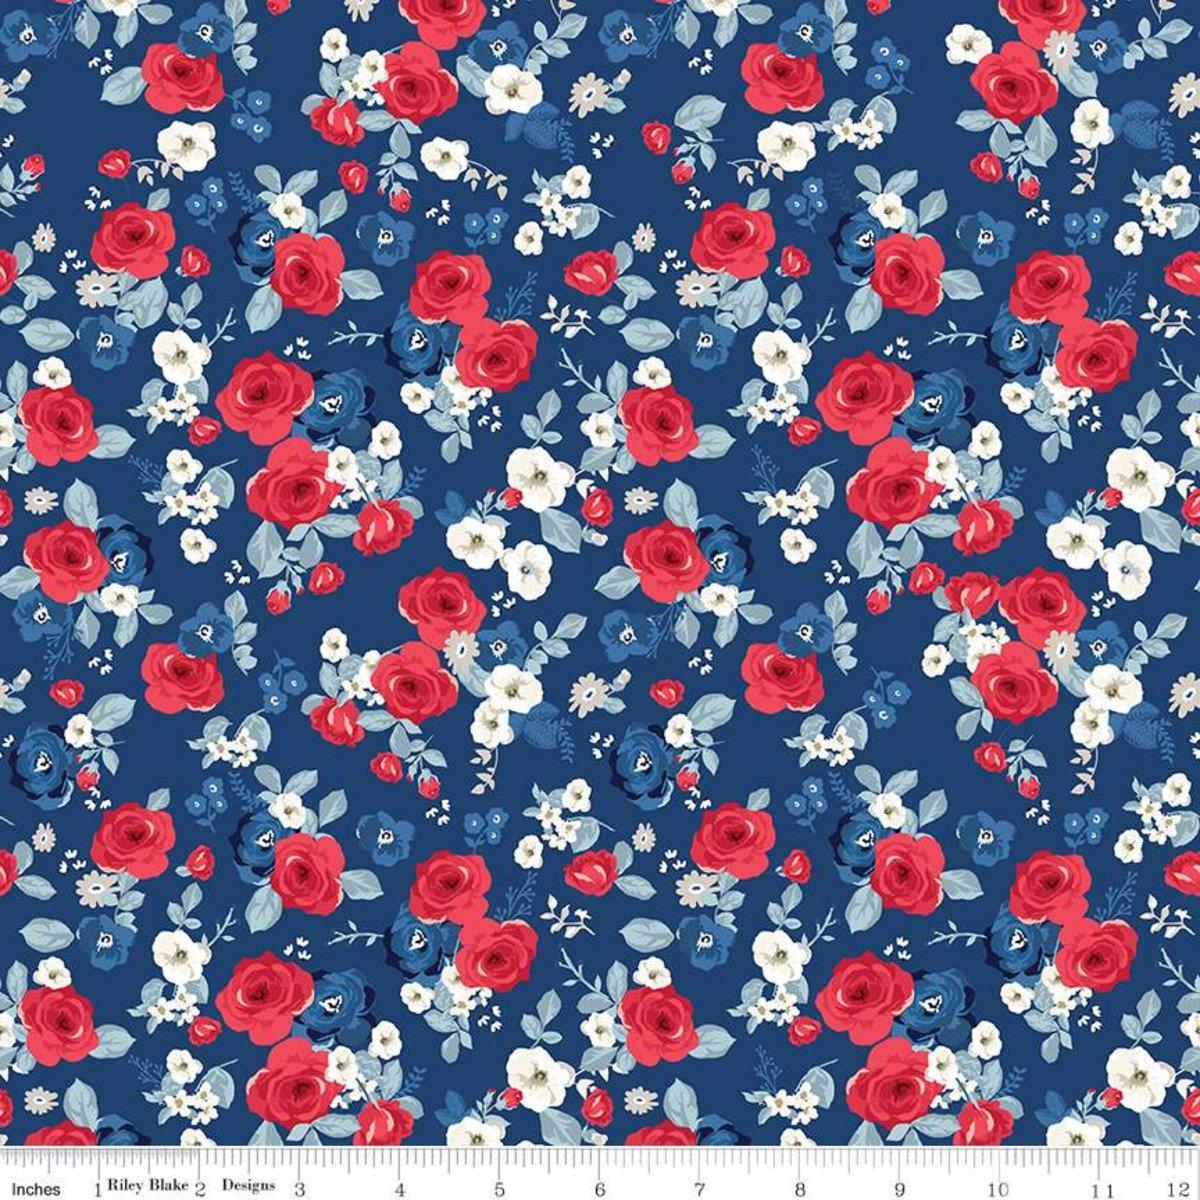 Floral Navy Land of Liberty Riley Blake Designs